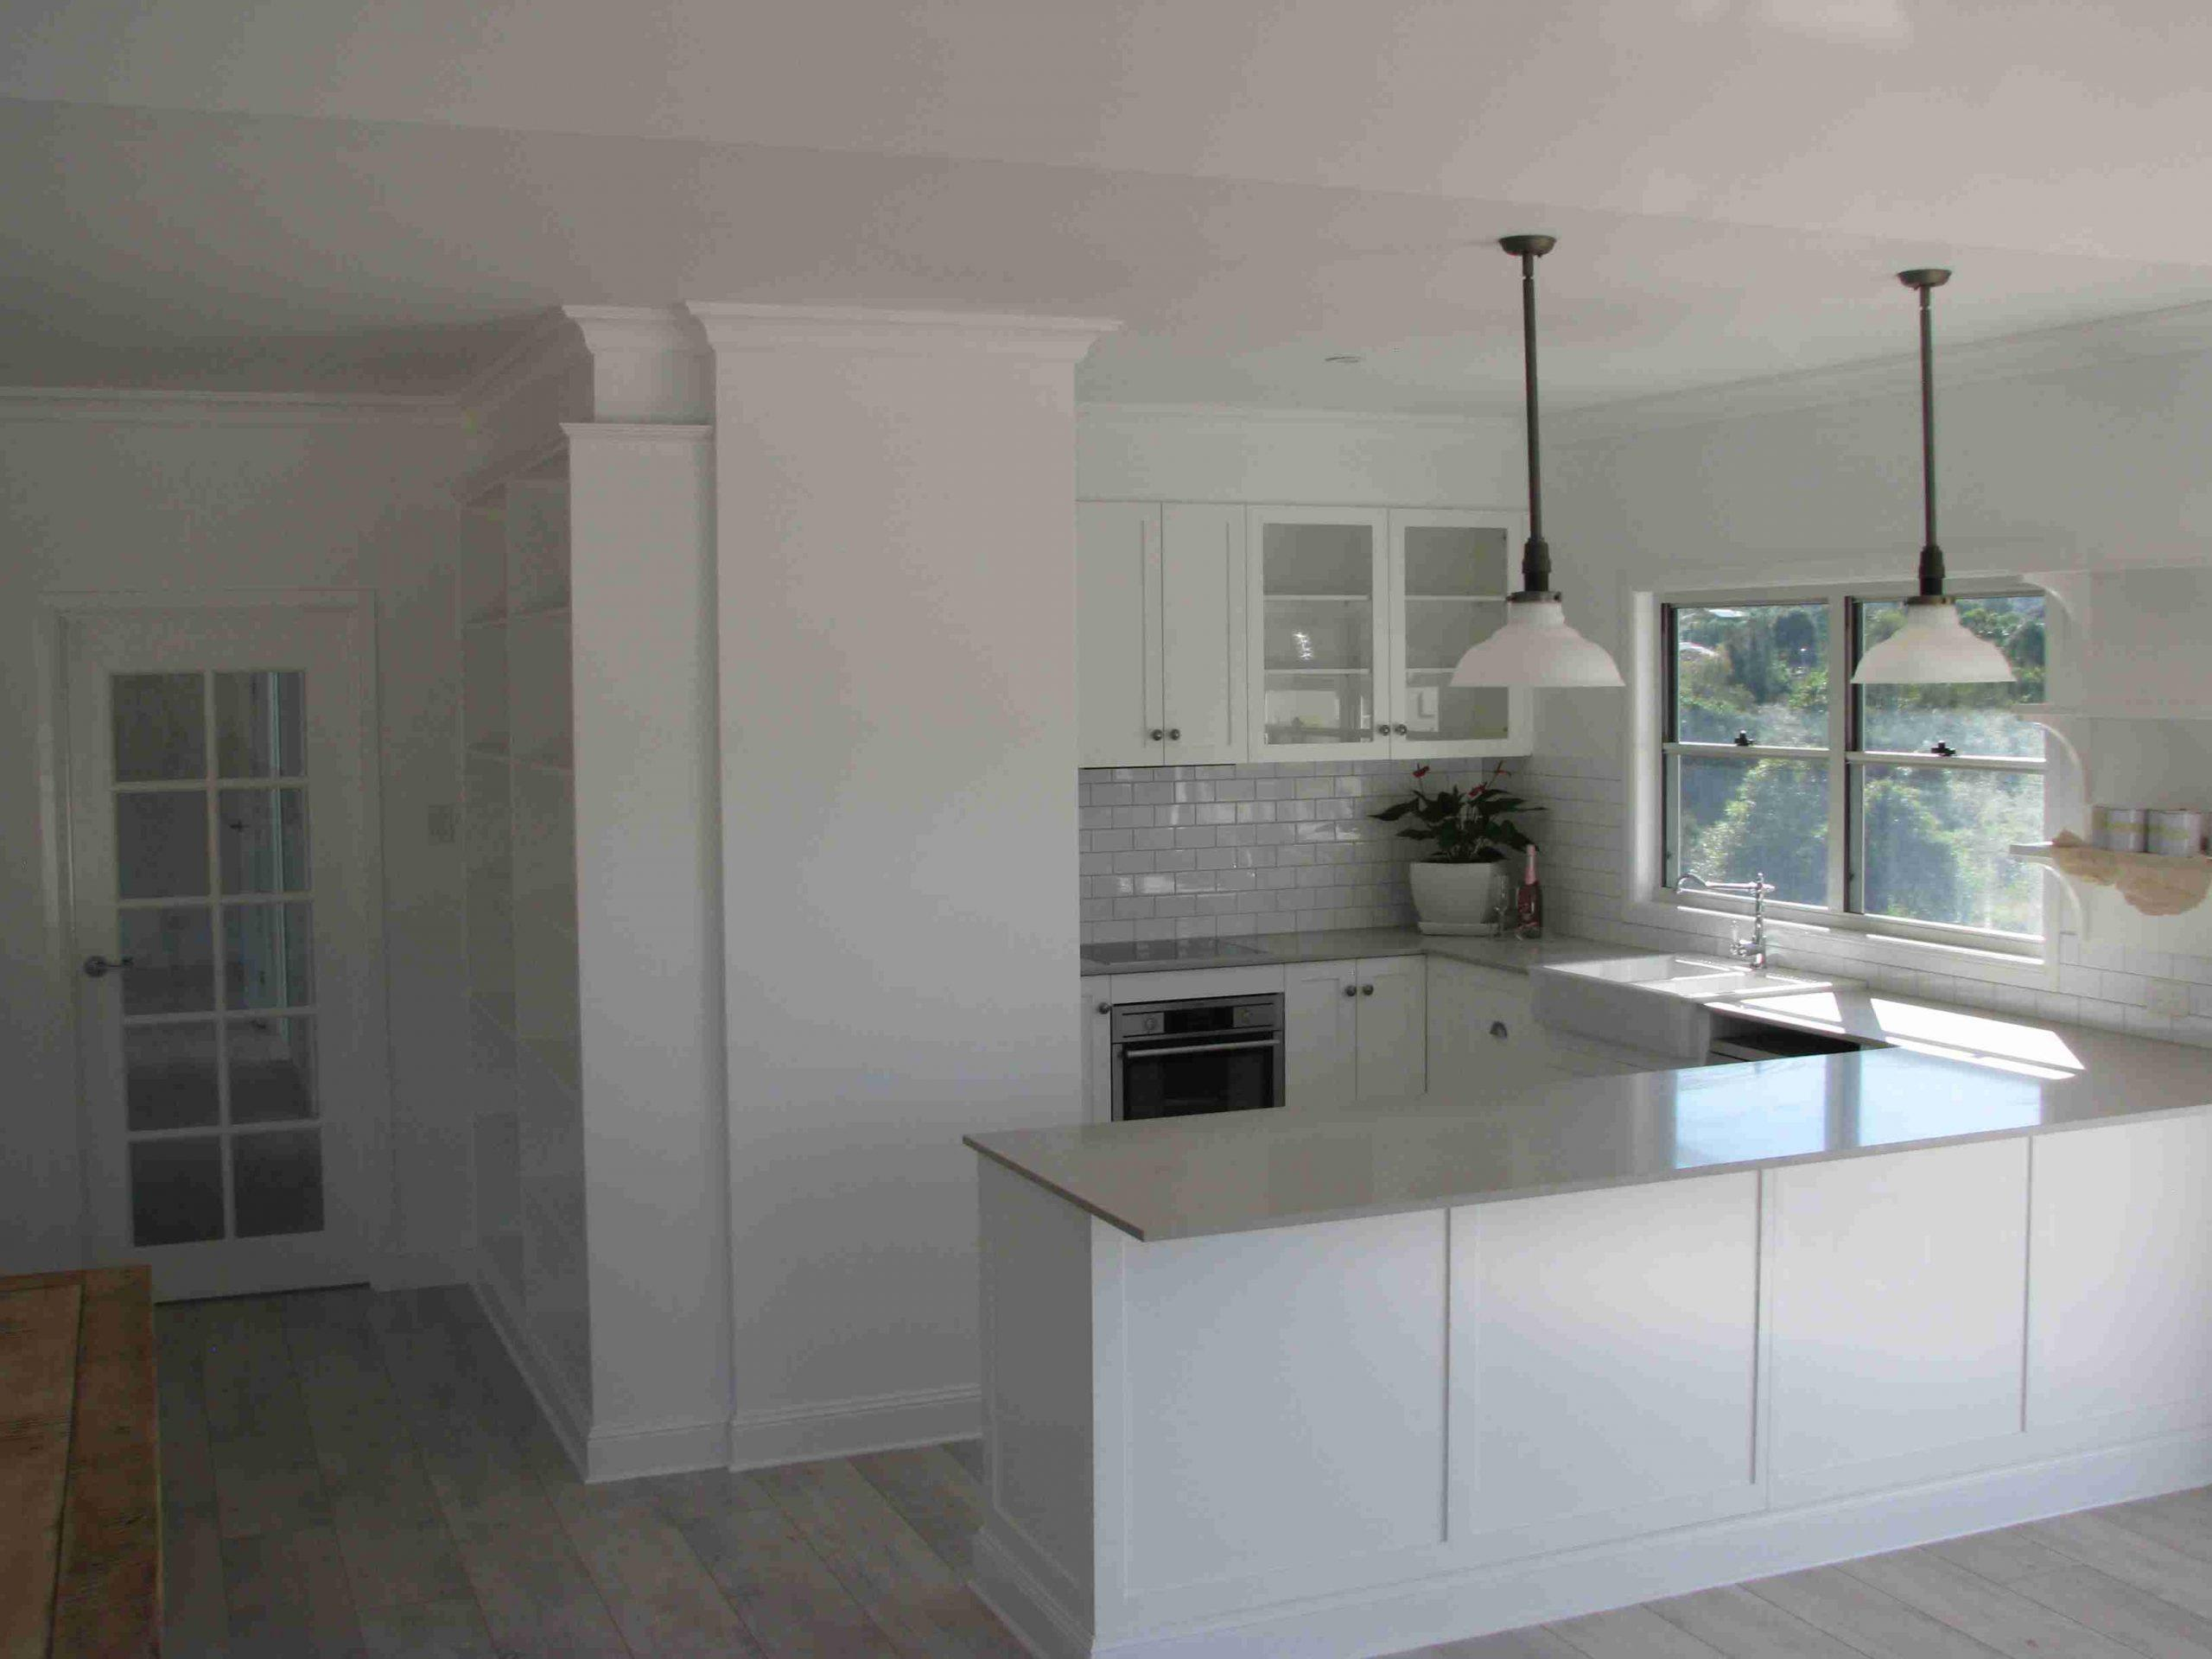 TJS - New Home in Toowoomba